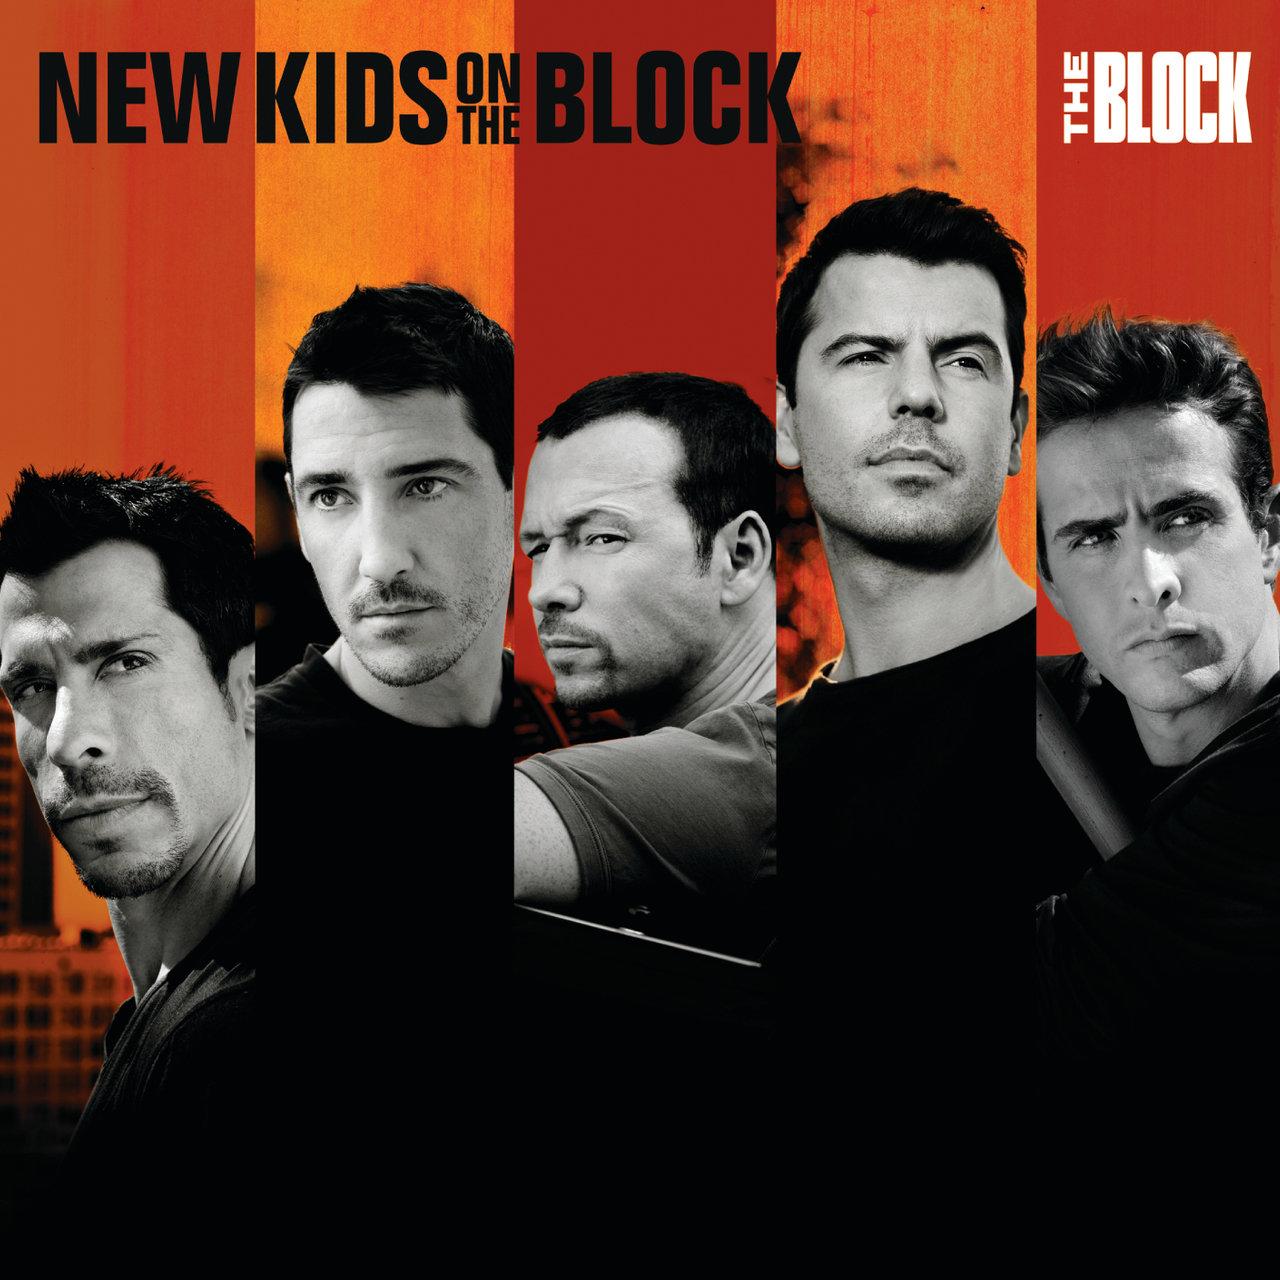 TIDAL: Listen to The Block on TIDAL